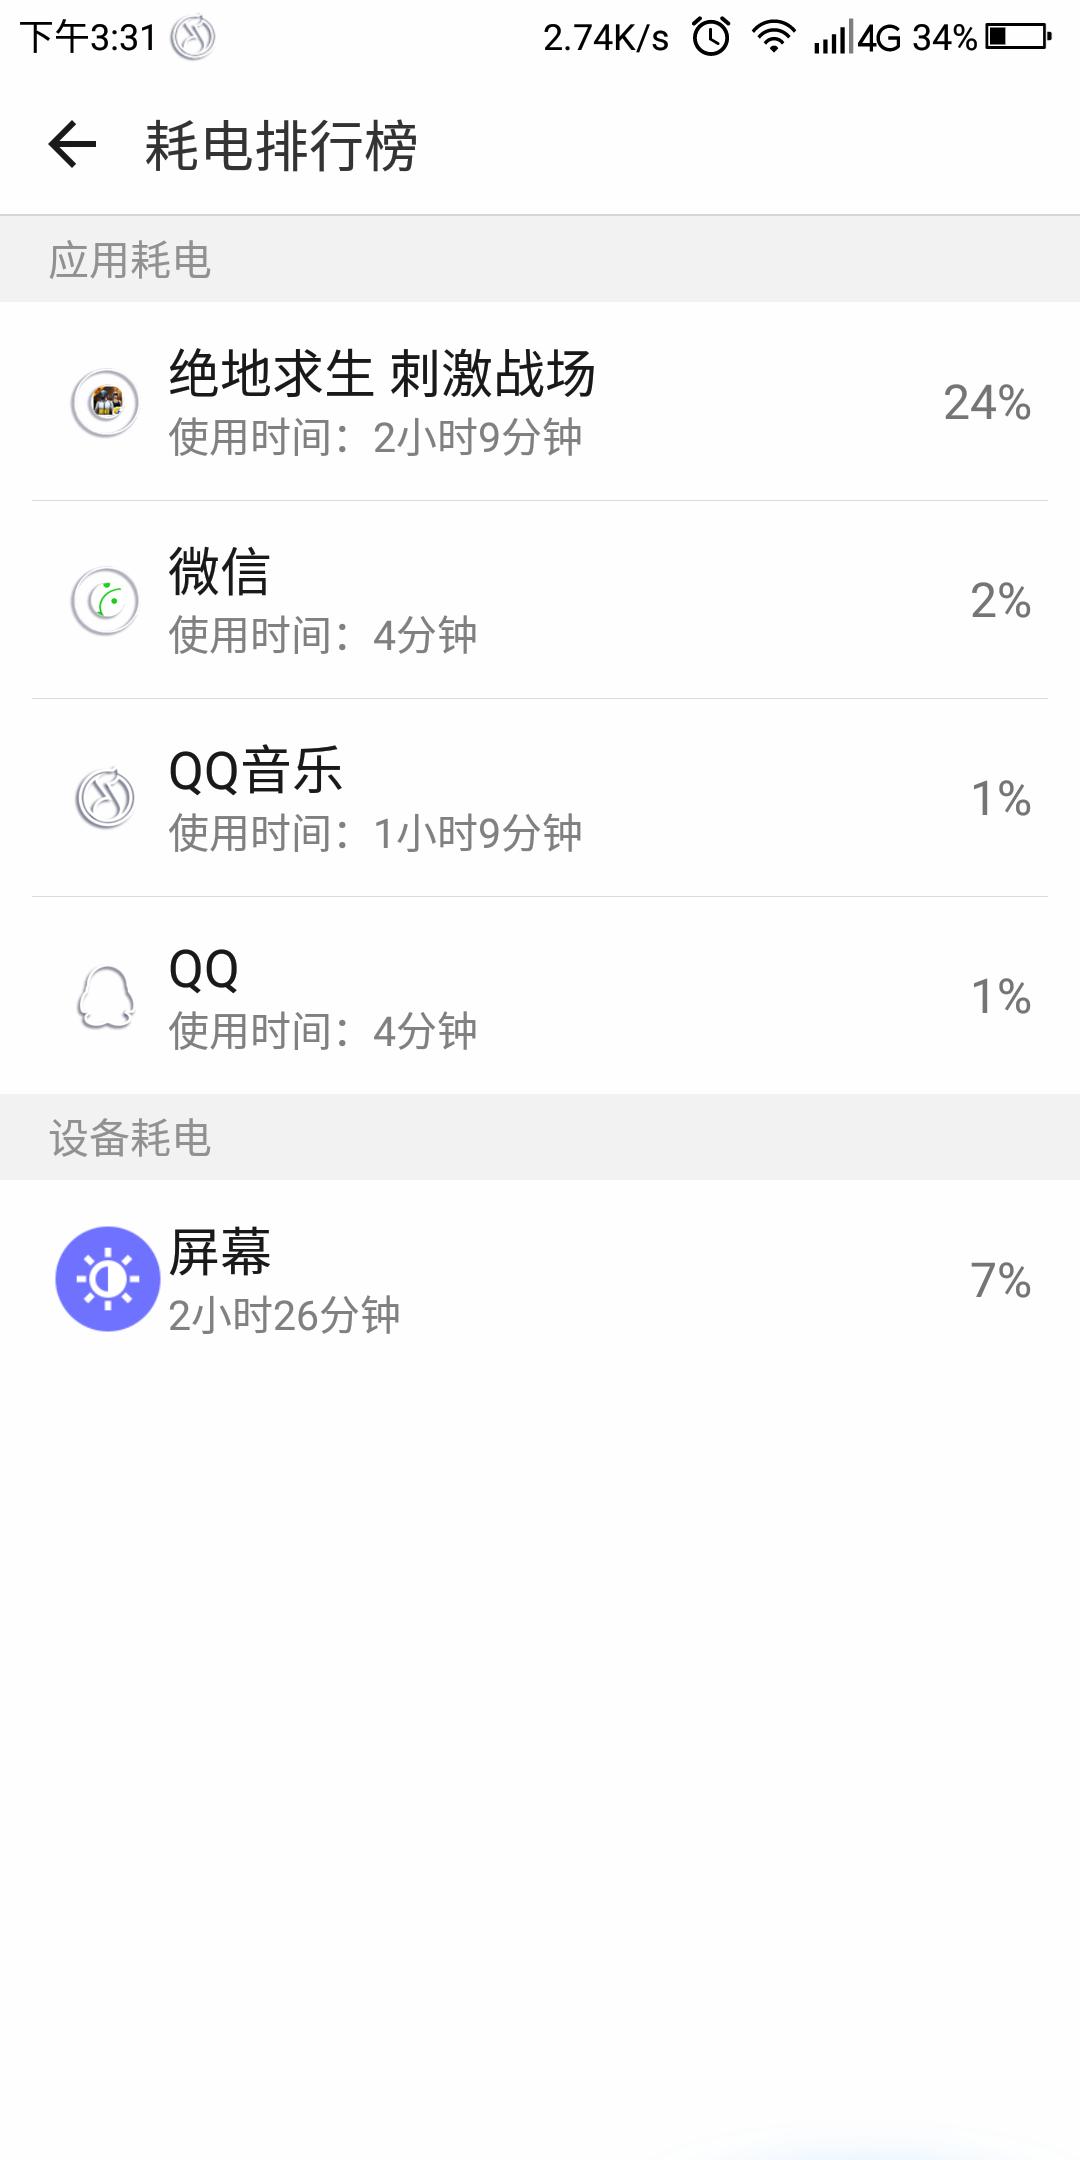 Screenshot_2018-08-09-15-31-23.png